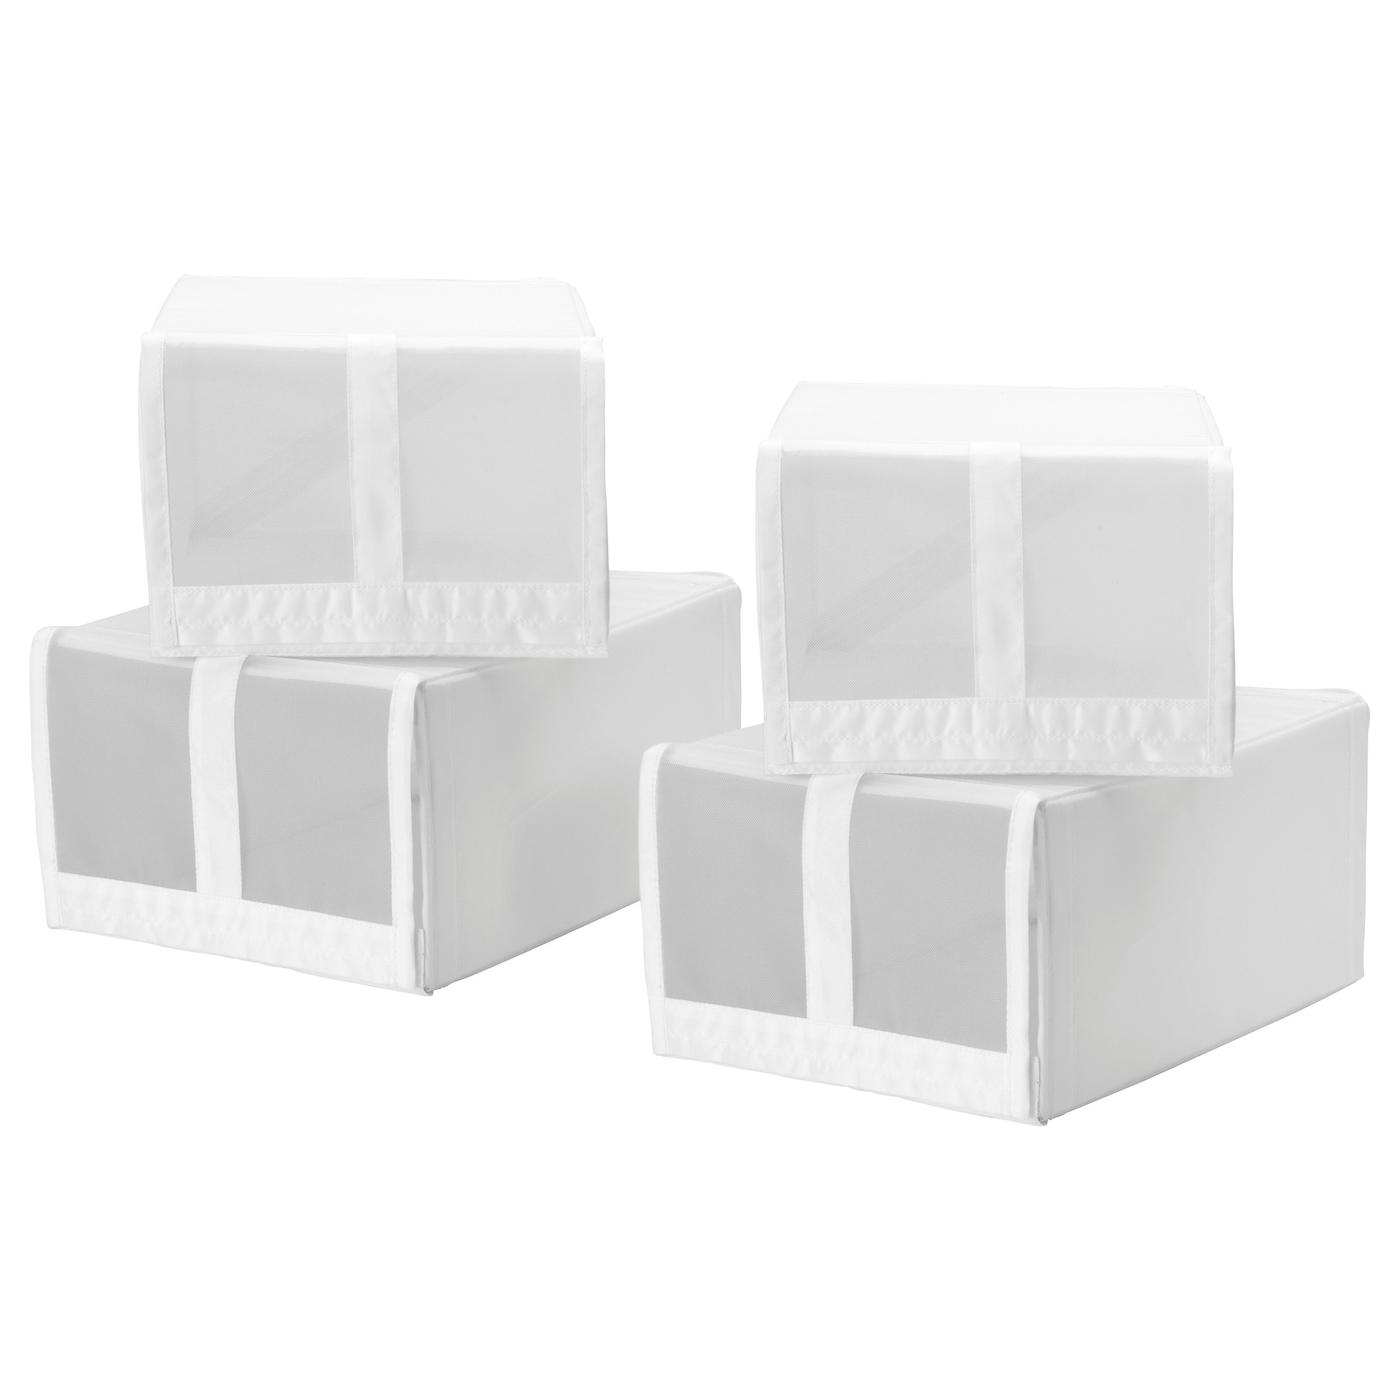 skubb shoe box white 22 x 34 x 16 cm ikea. Black Bedroom Furniture Sets. Home Design Ideas